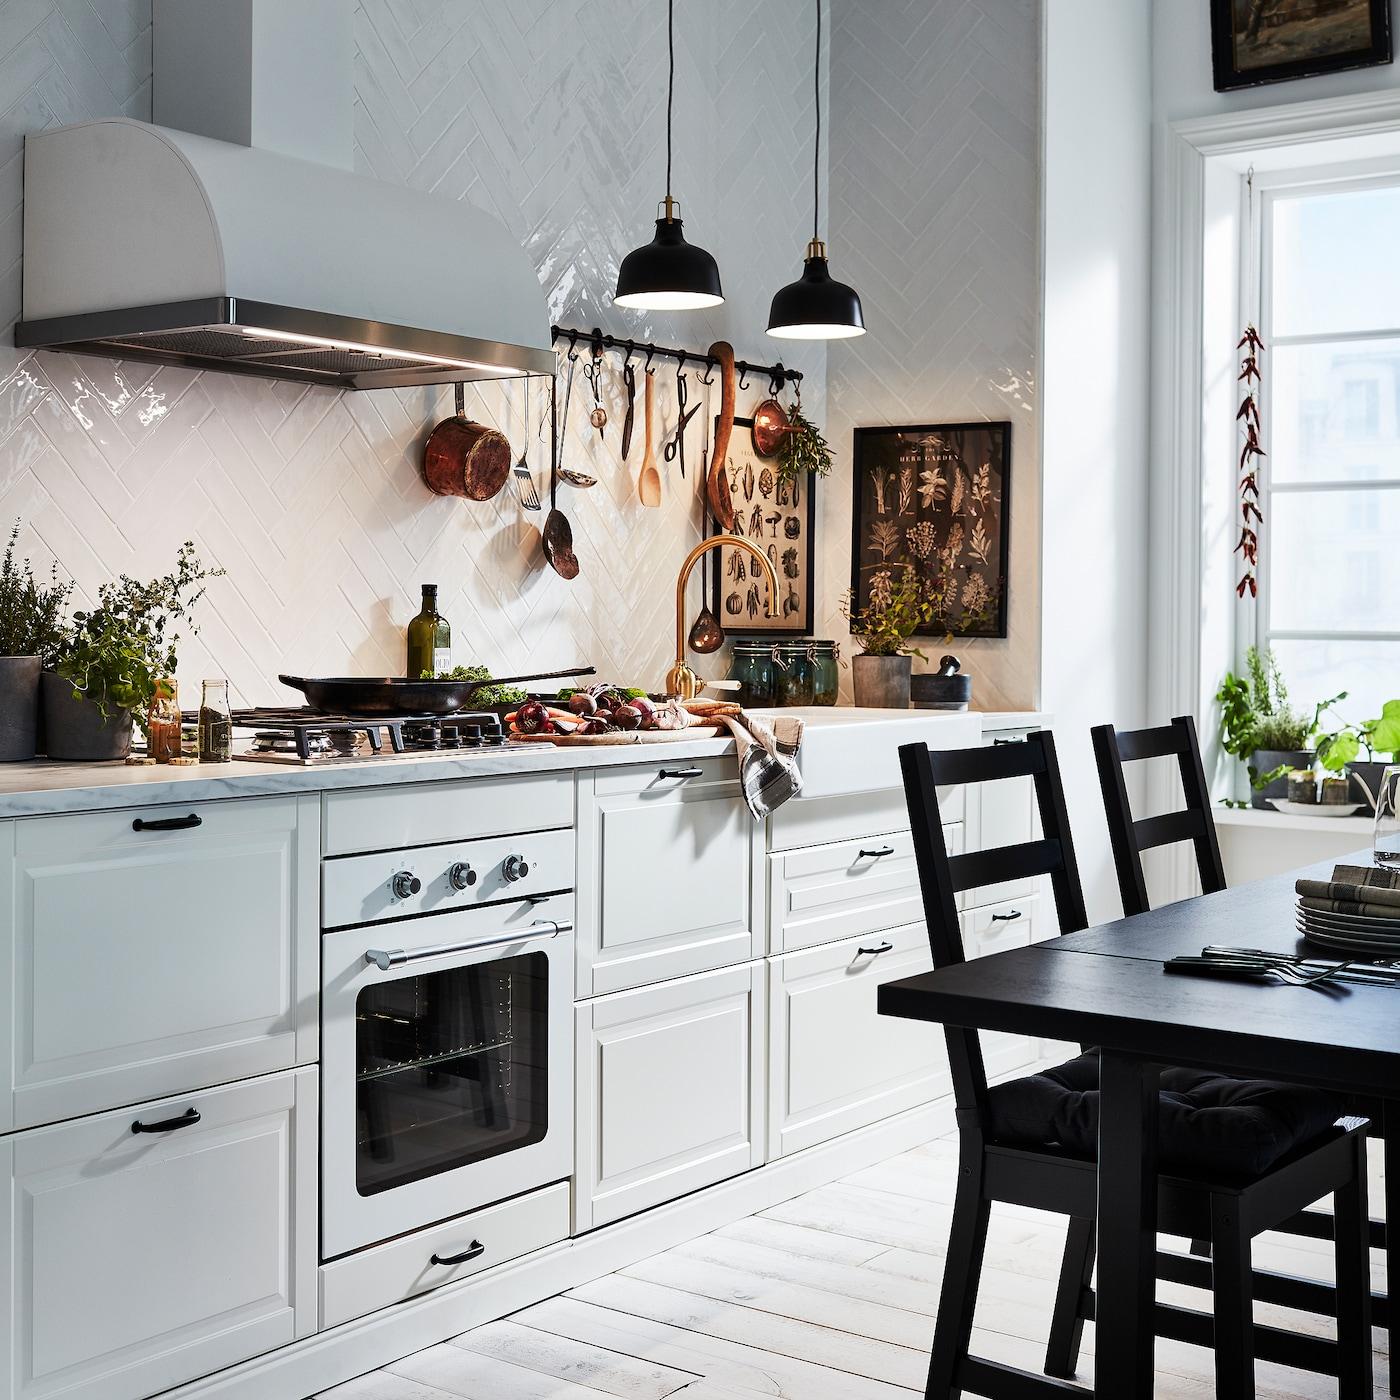 Tavoli Da Cucina Piccole Dimensioni.Lasciati Ispirare Dalle Nostre Cucine Ikea